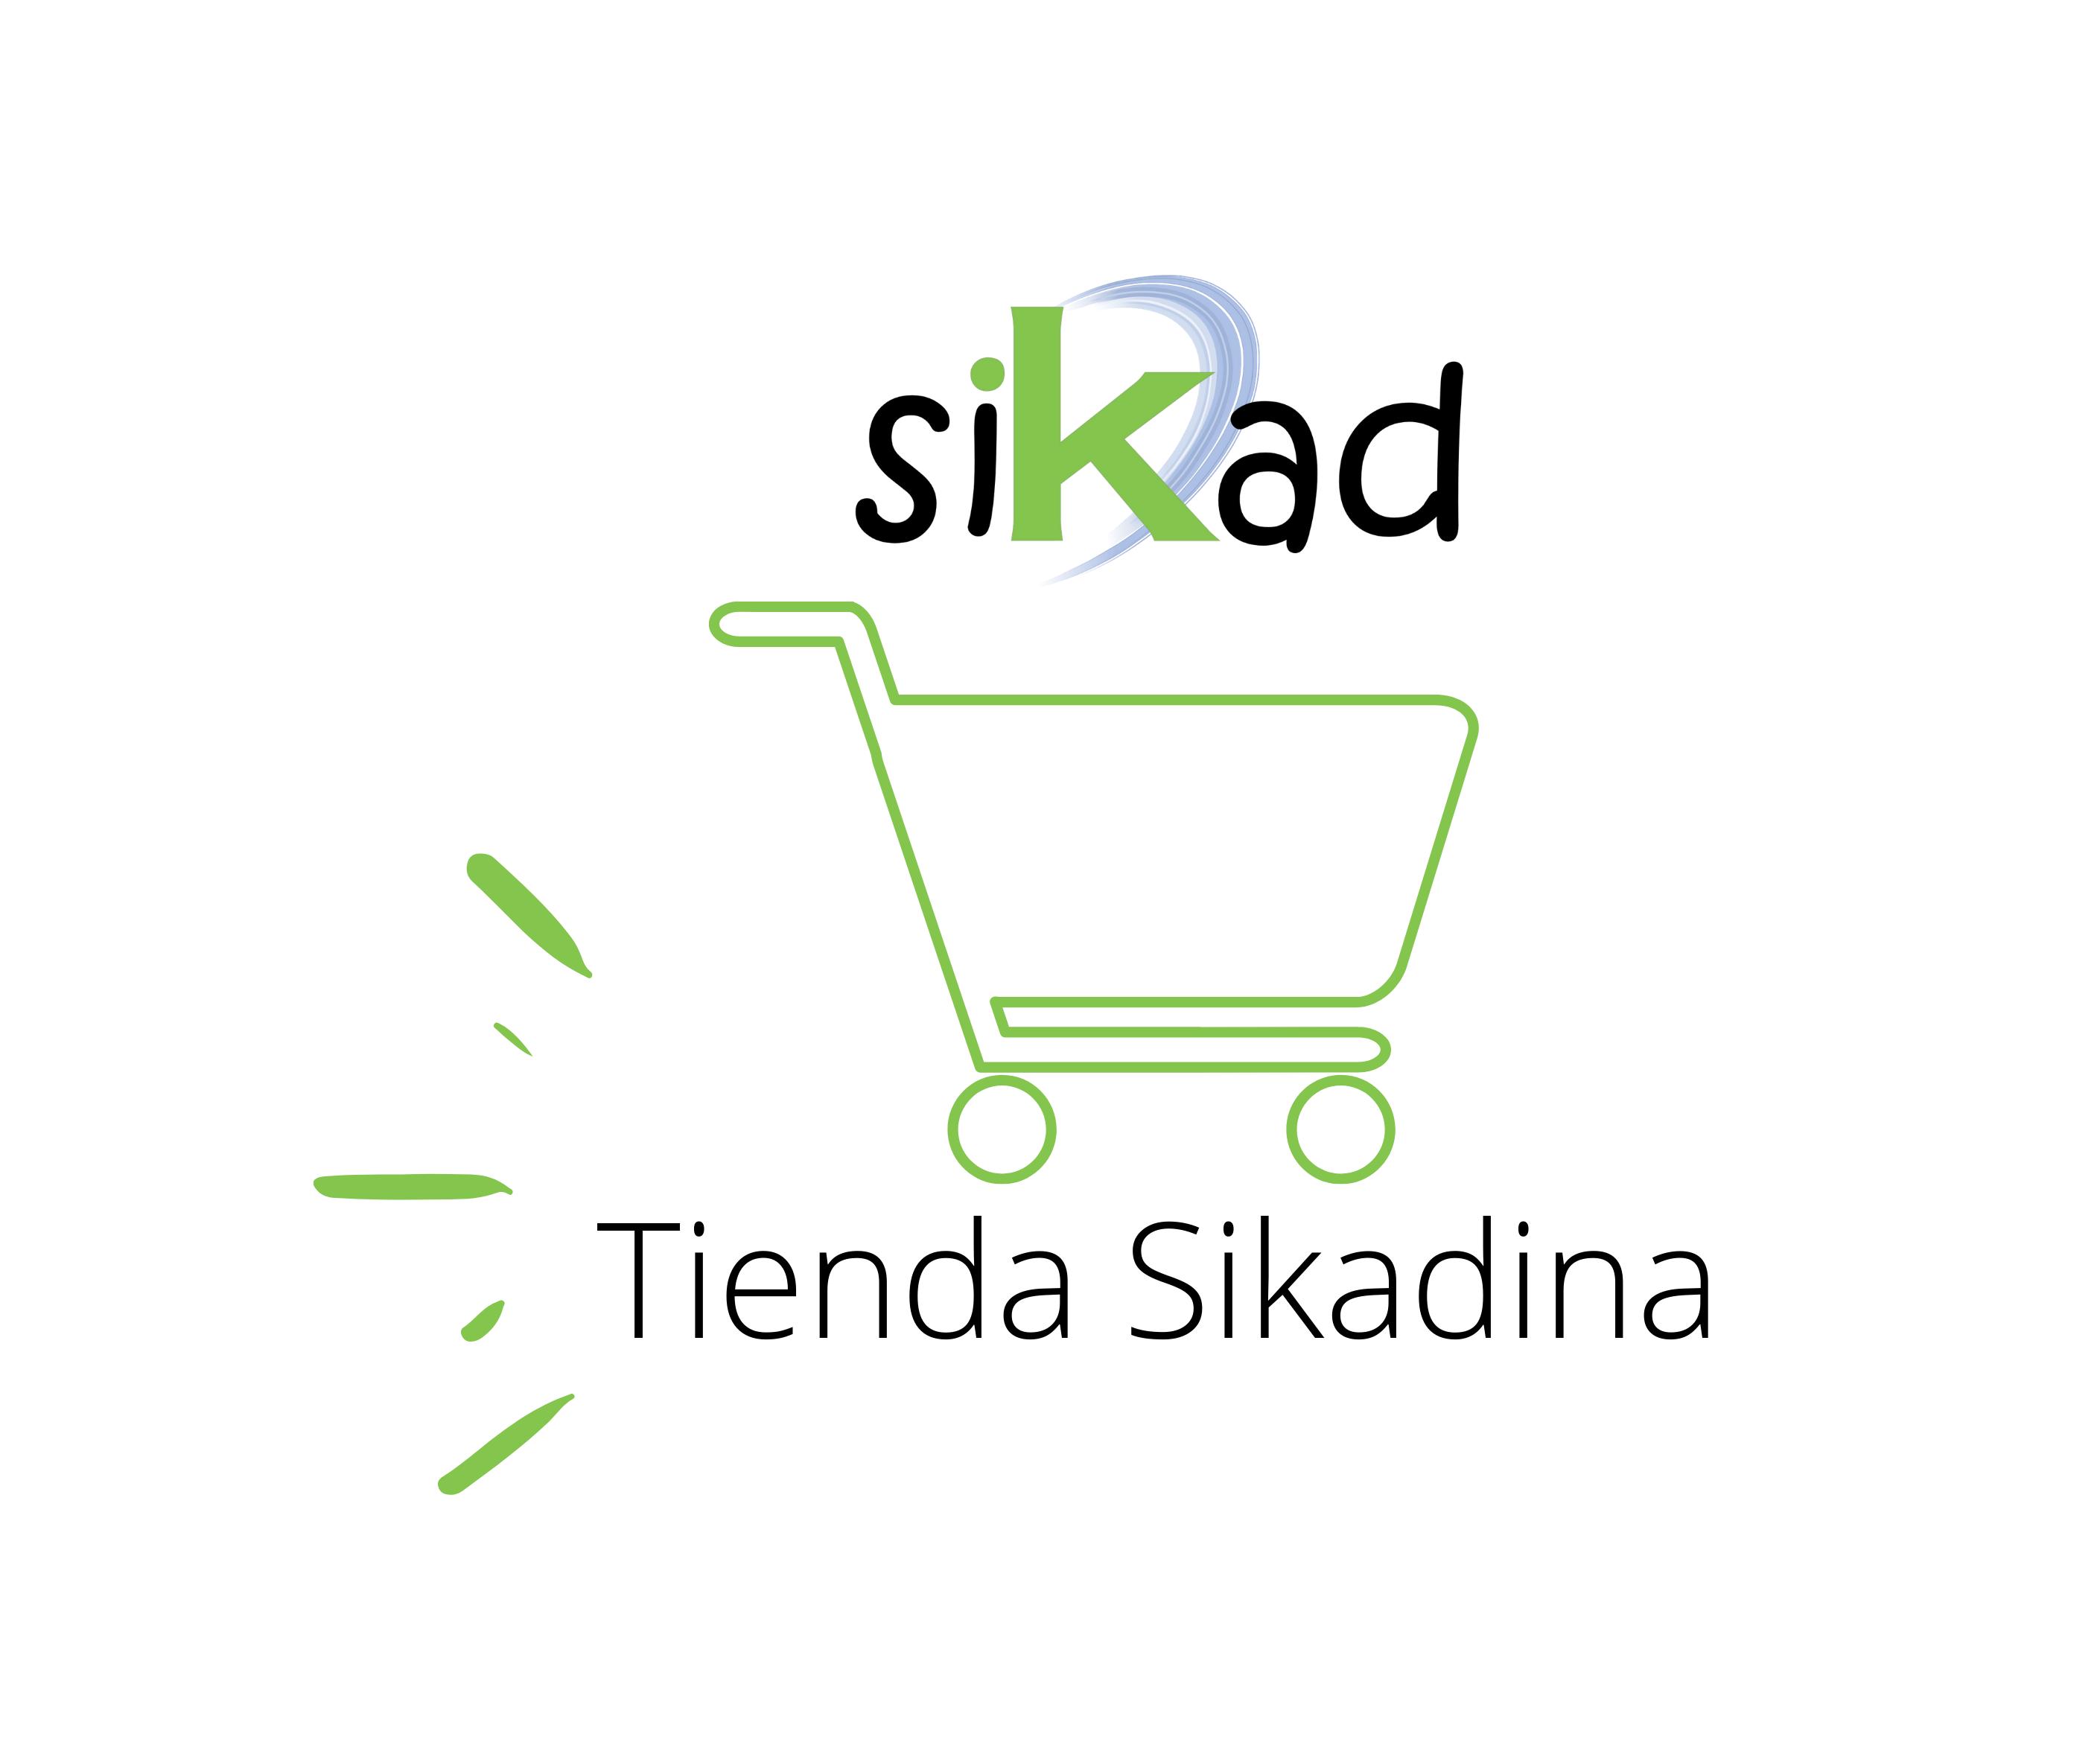 Bienvenido Tienda Sikadina